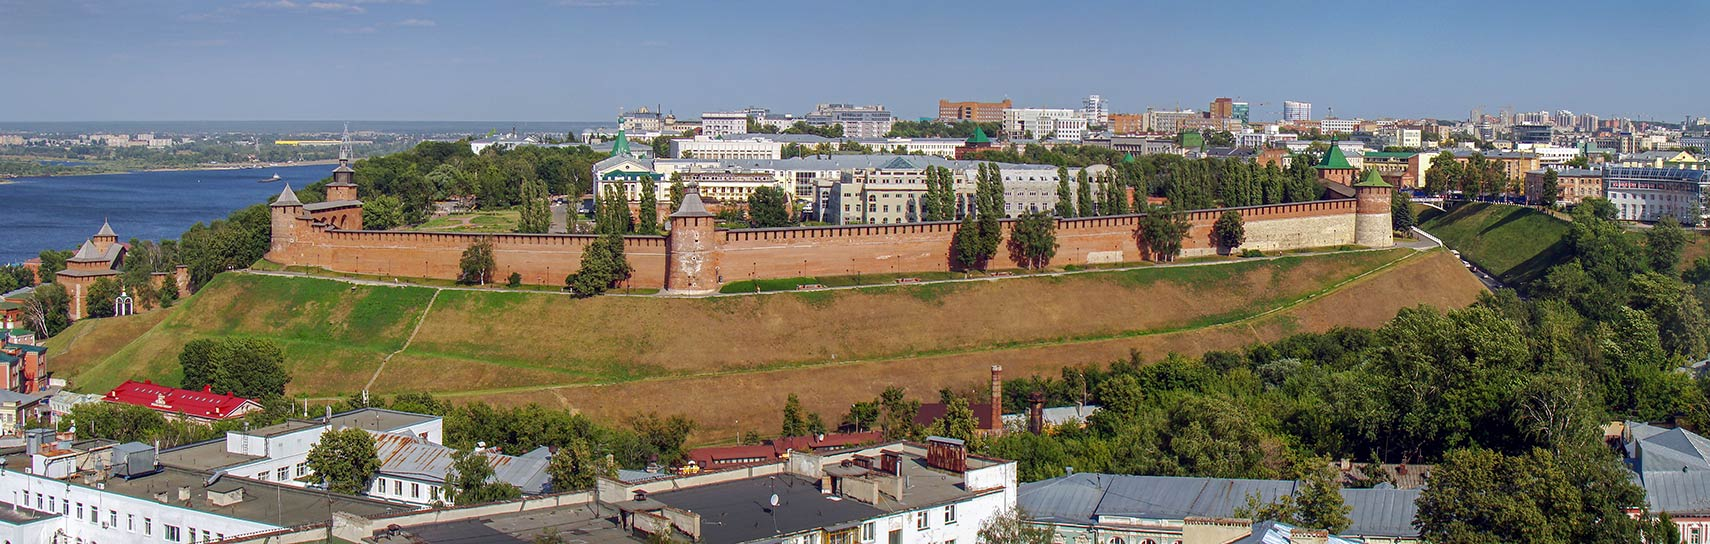 Google Map Of Russia.Google Map Of Nizhny Novgorod Russian Federation Nations Online